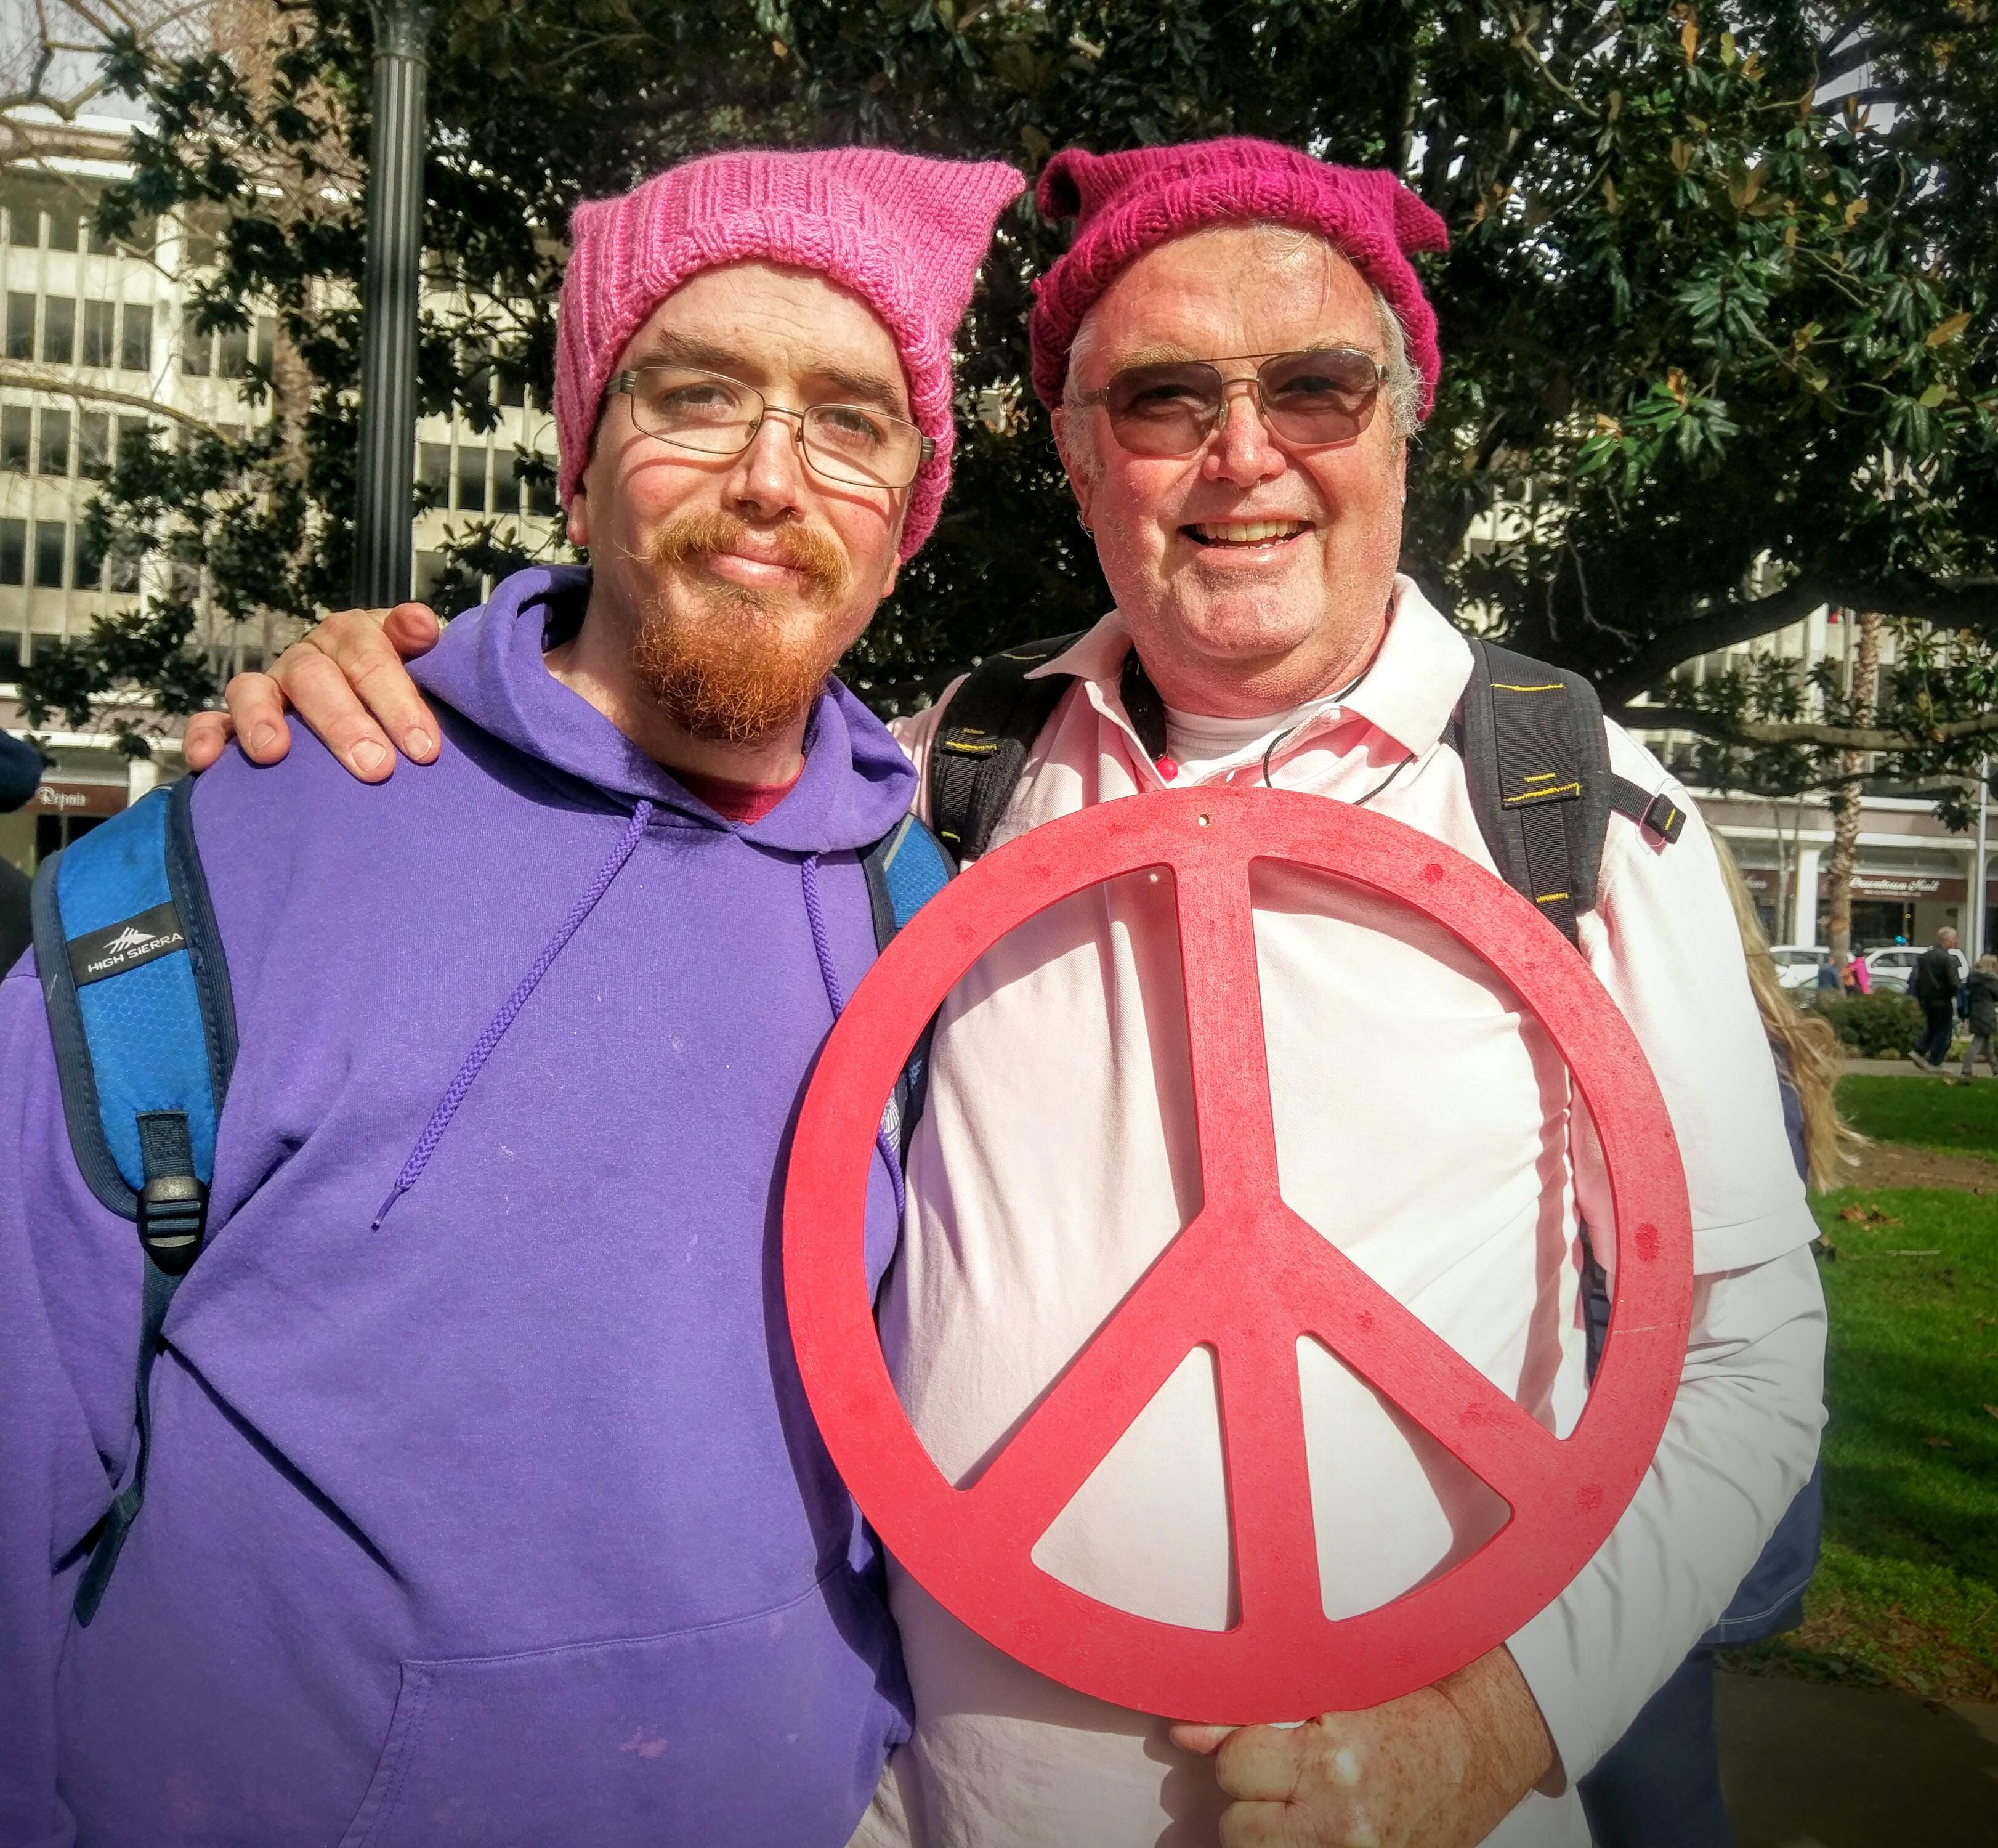 f83337e7917 File Sacramento Women s March men wearing pussyhats .jpg. From Wikimedia  Commons ...